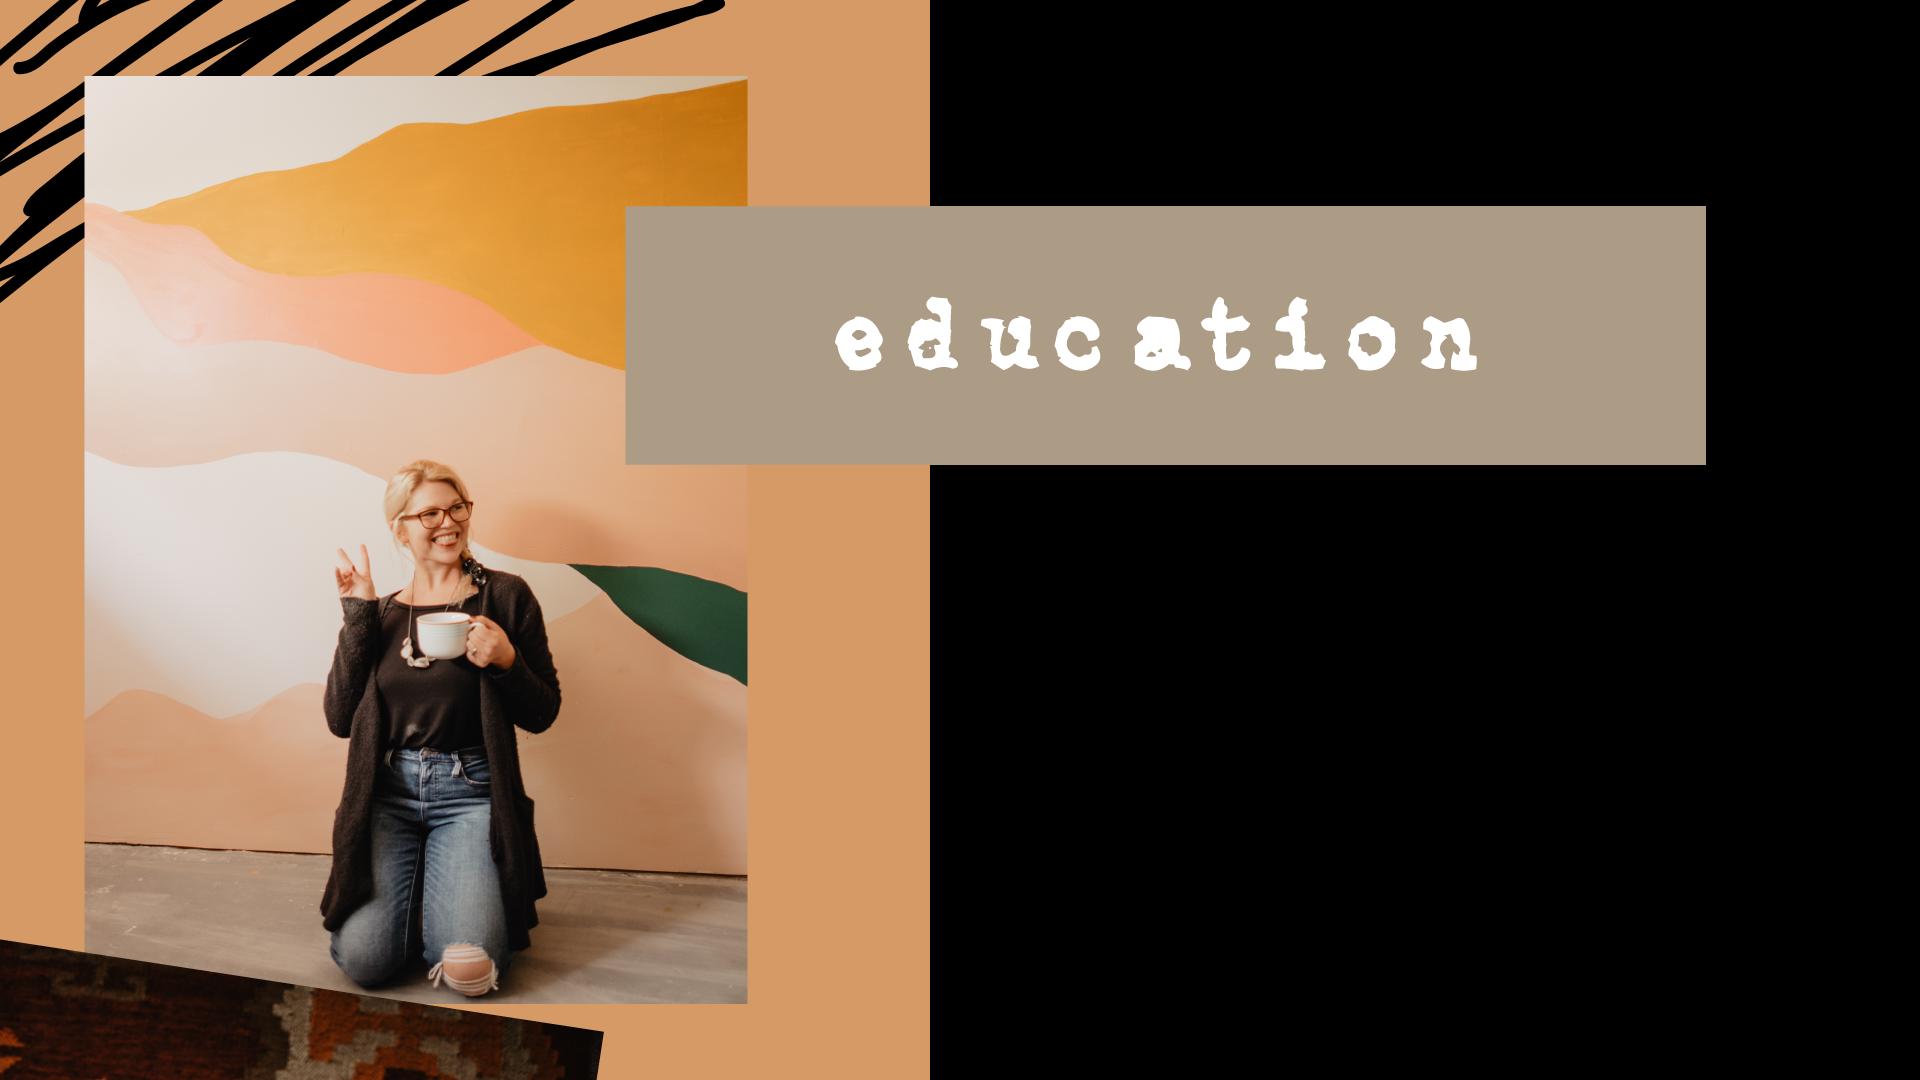 education-blog.png